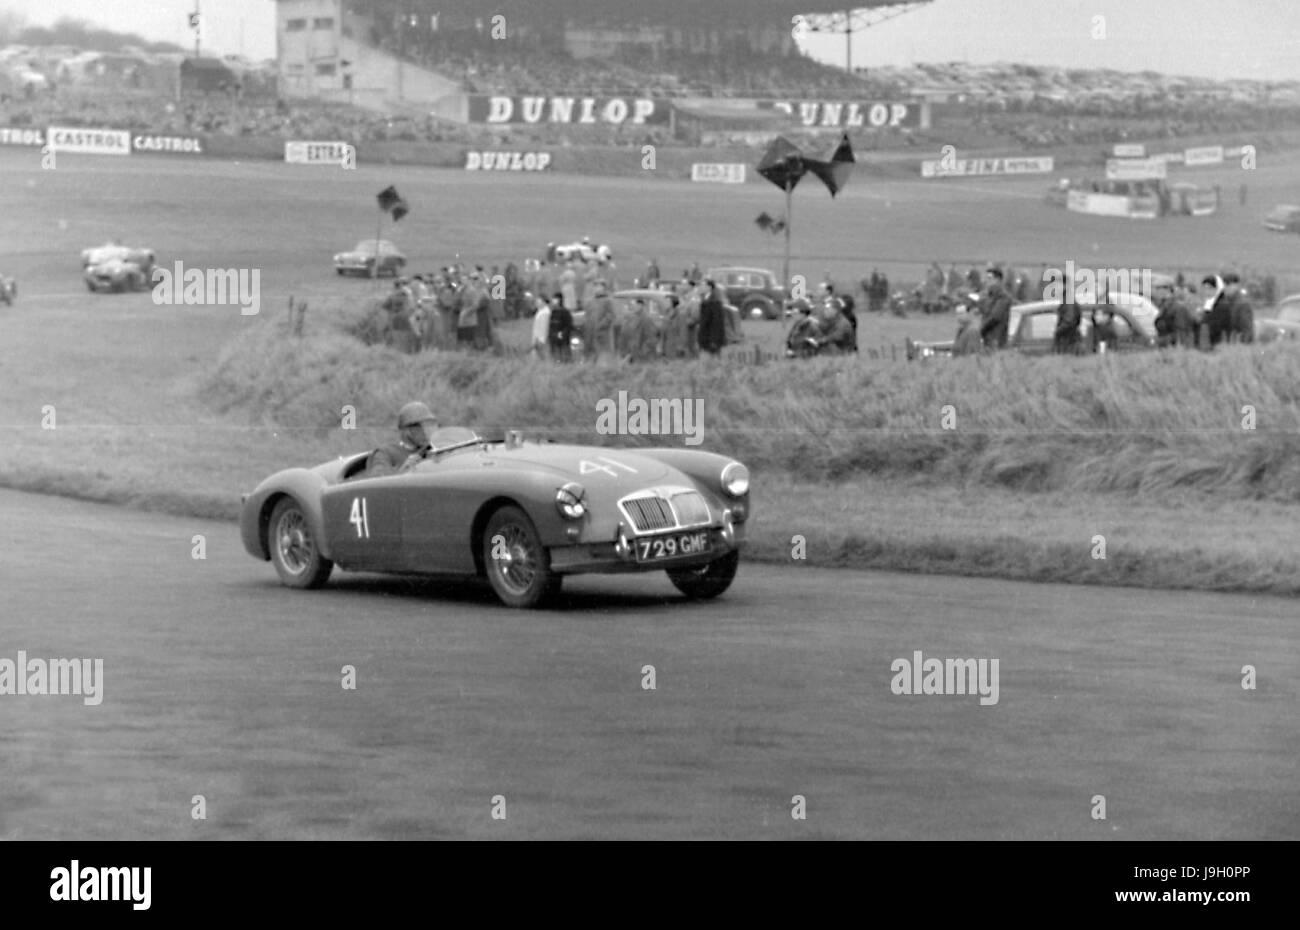 MGA, C.Shove in Brands Hatch 26. Dezember 1957 Stockbild